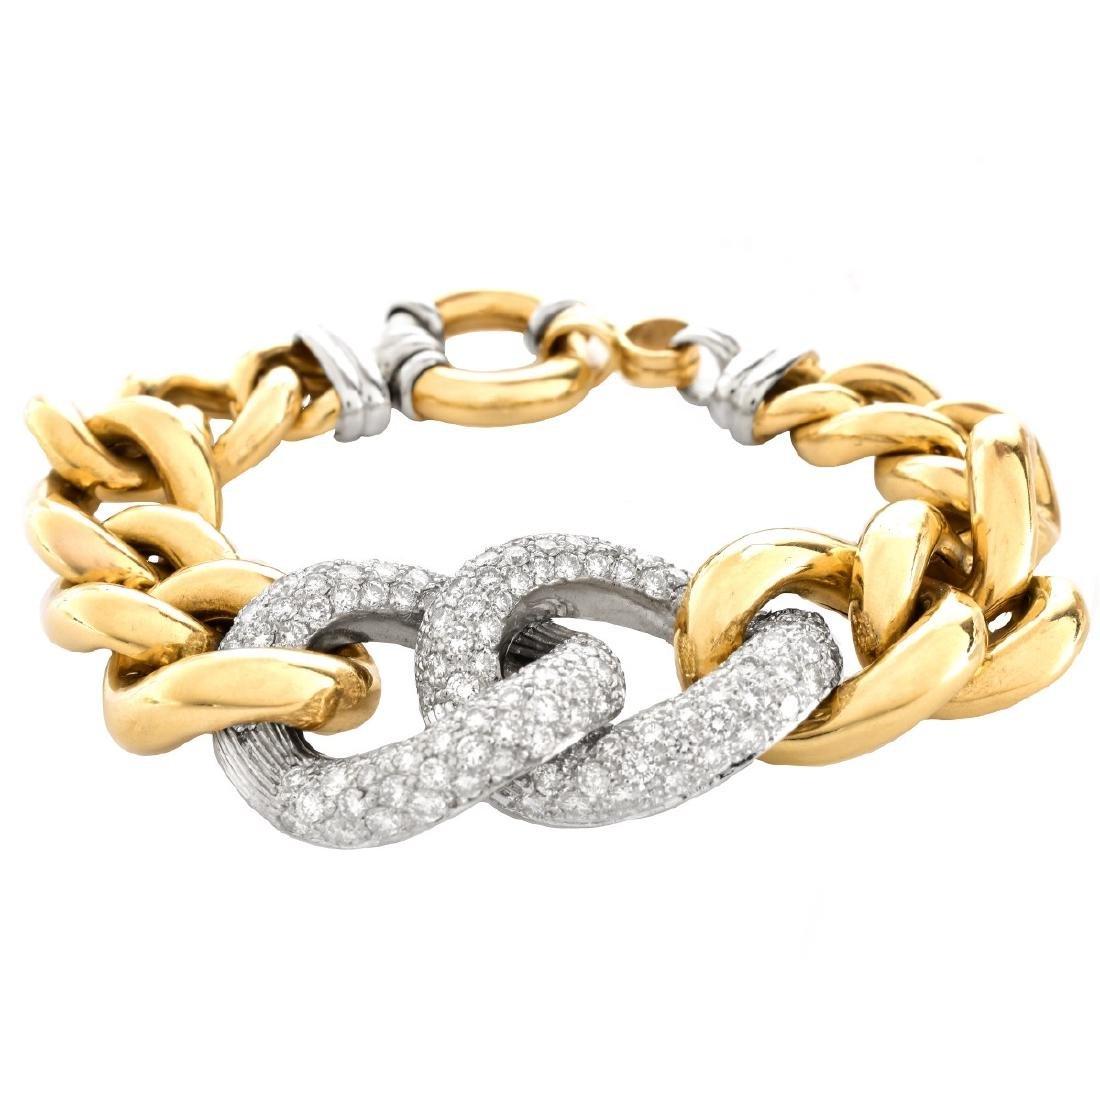 Vintage Italian Diamond and 18K Gold Bracelet